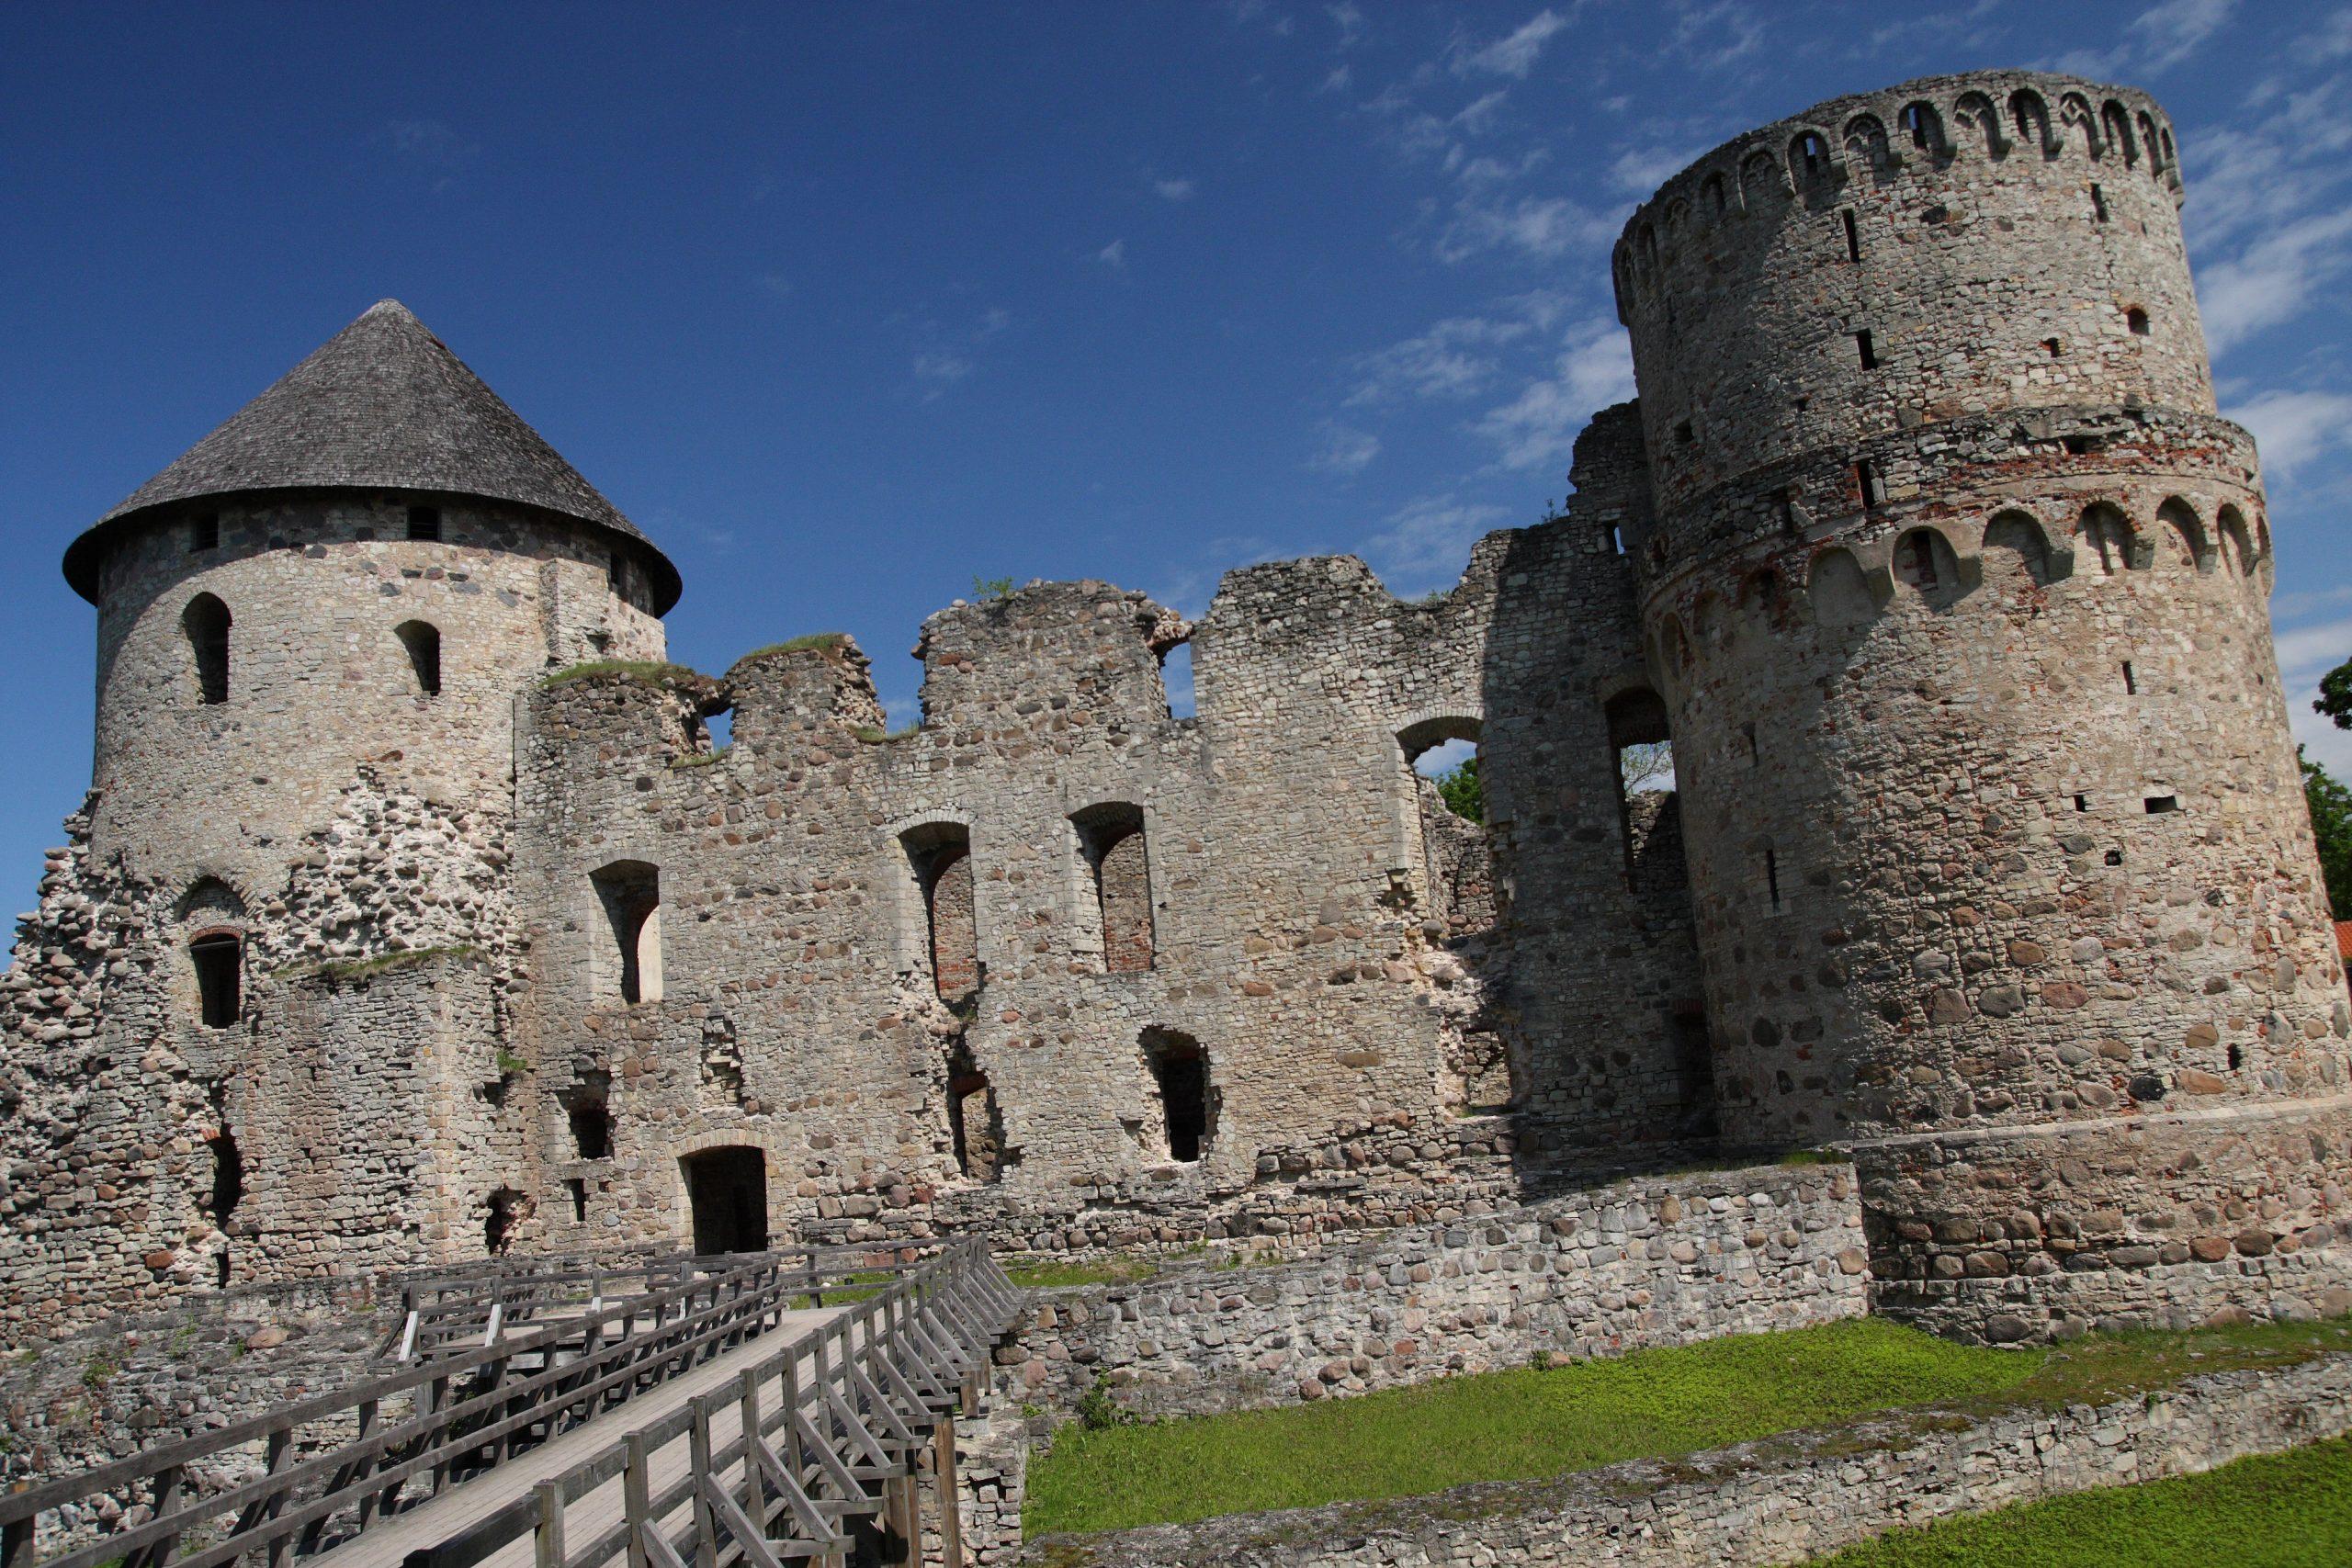 Cesis-Best Cities to Visit in Latvia